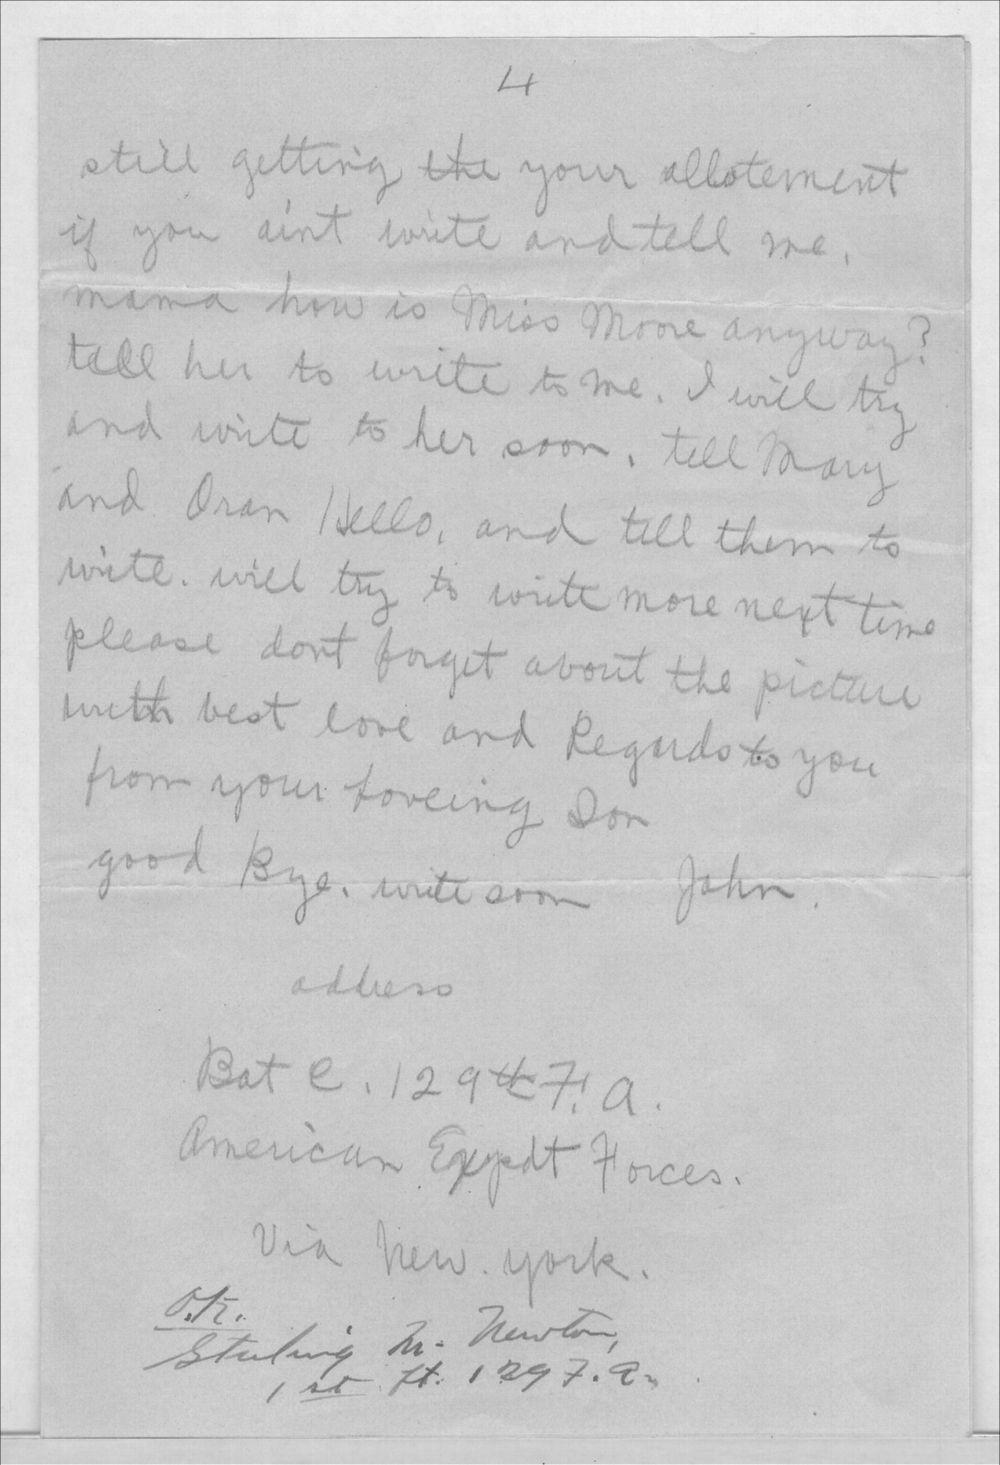 John A. Gersic to Mrs. Joseph Gersic - 4